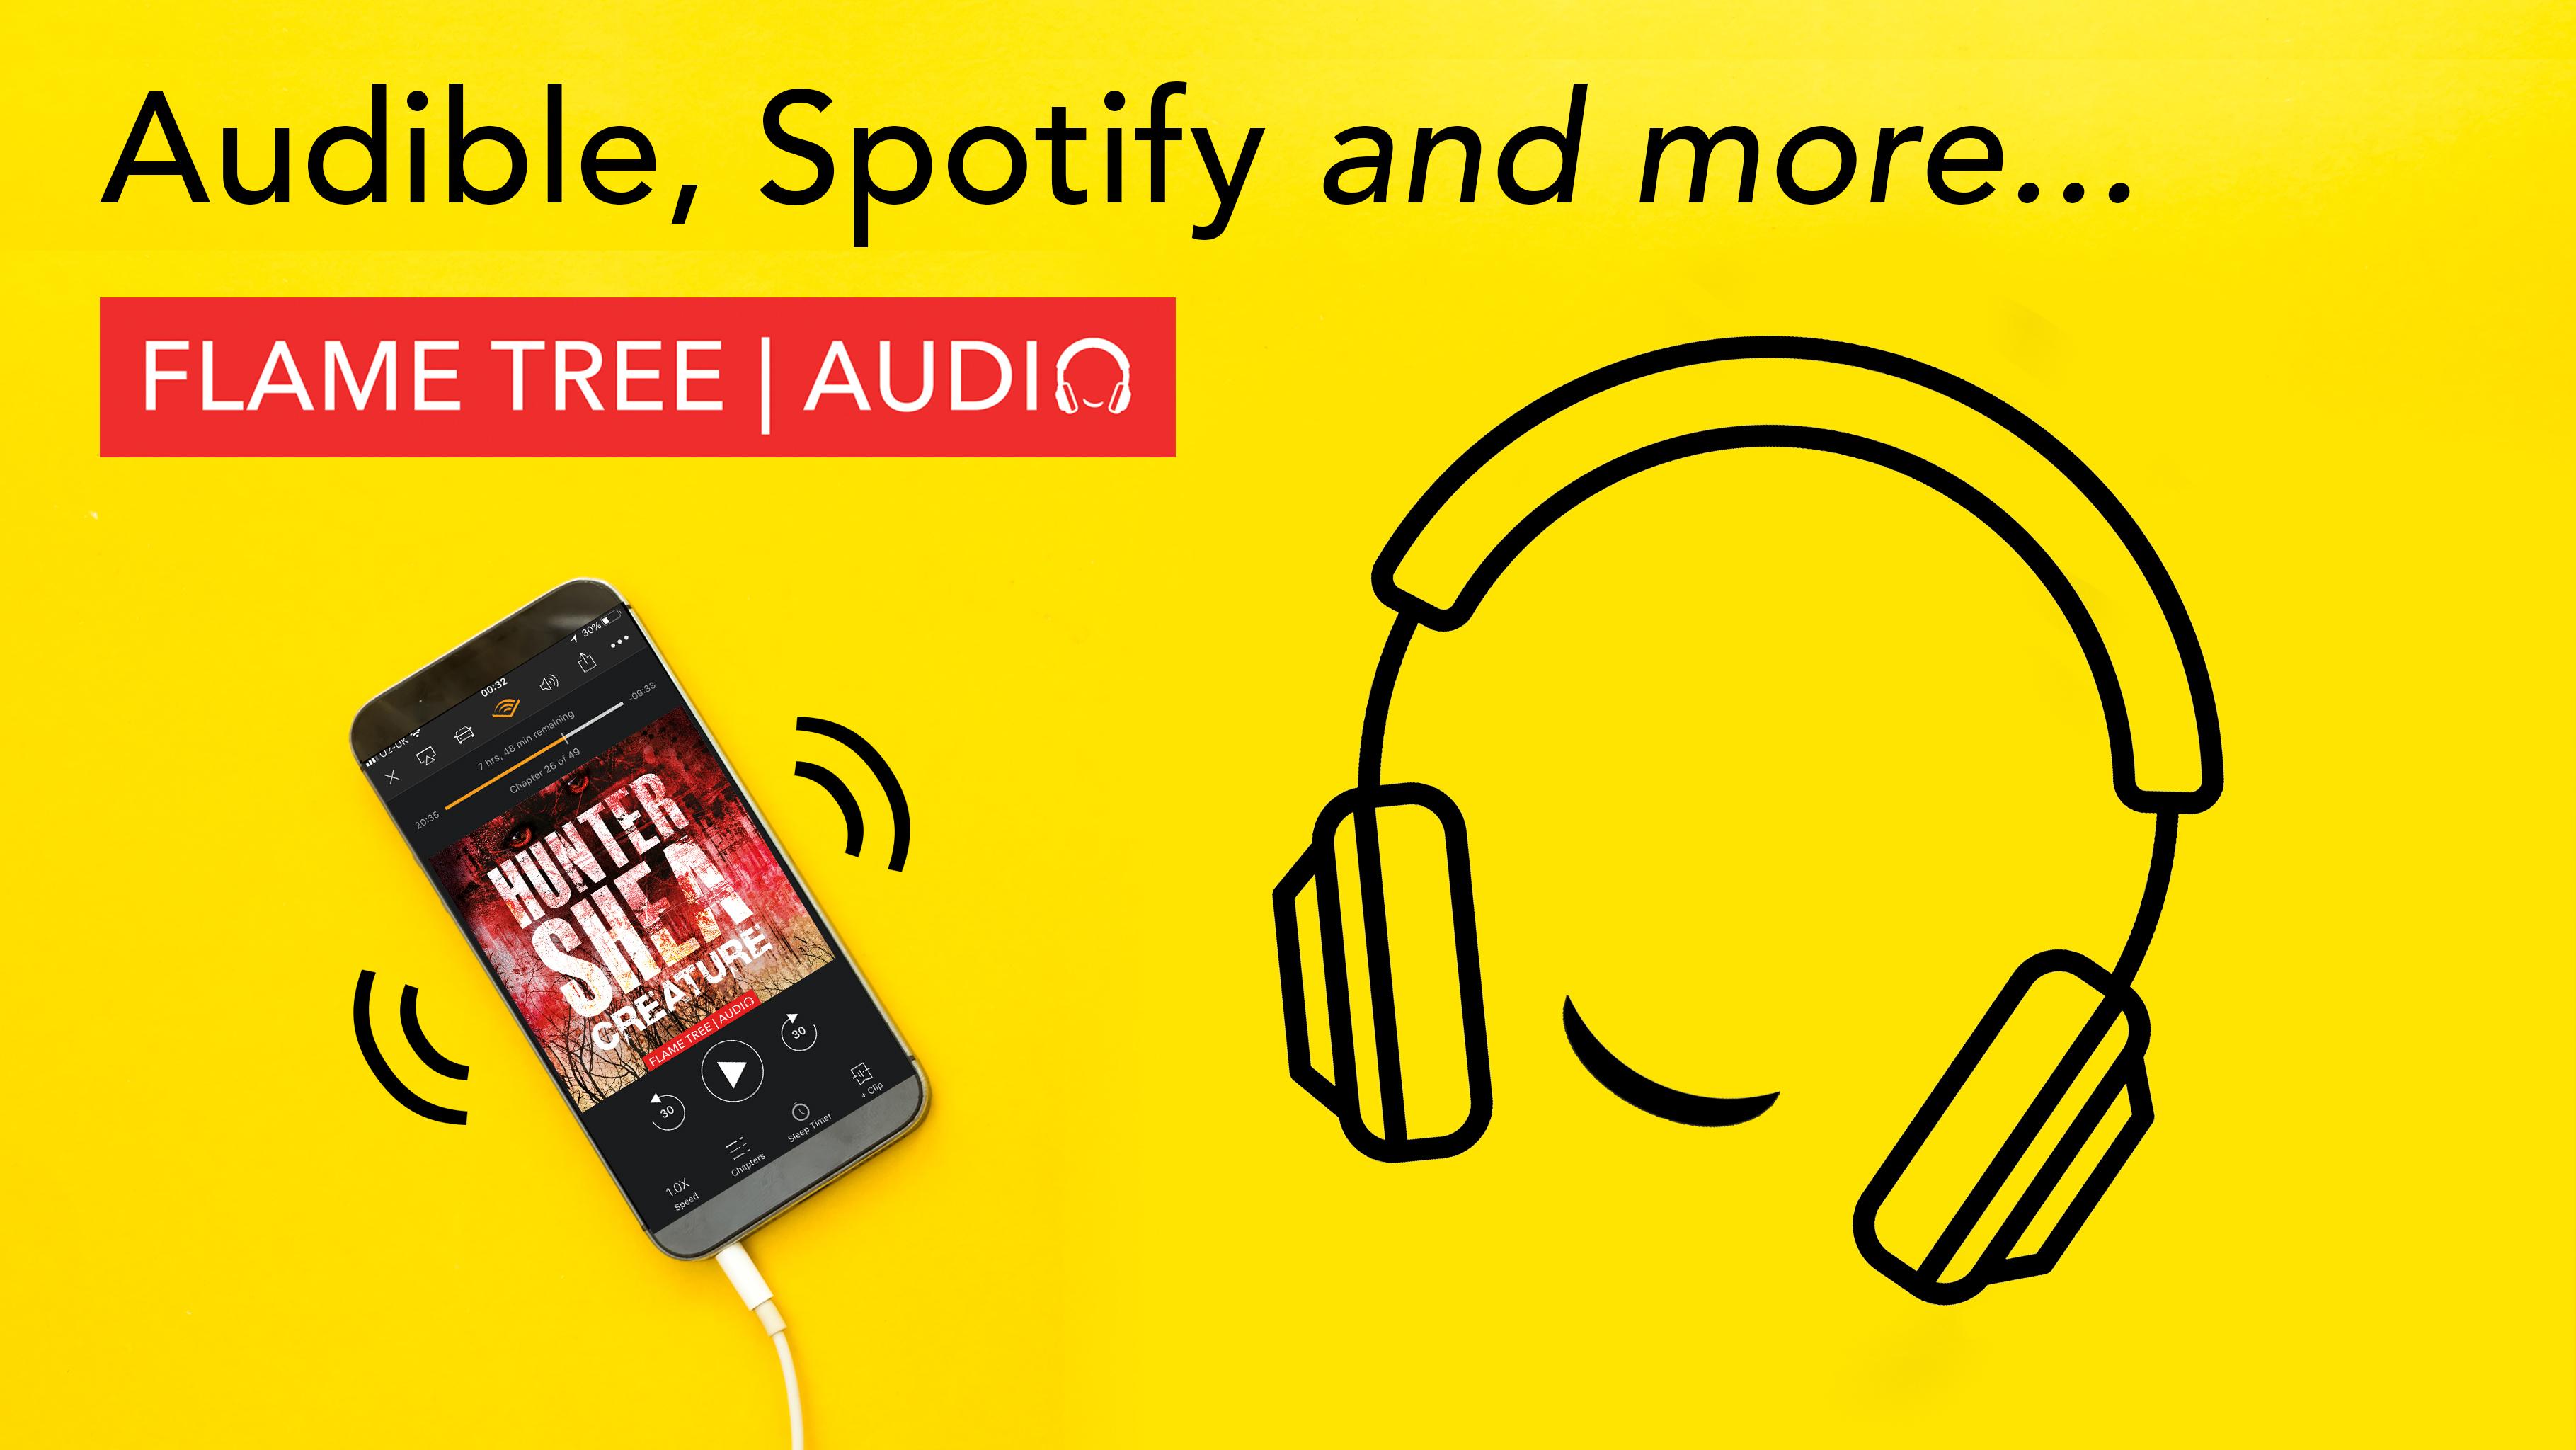 Flame Tree Audiobooks, anytime, anywhere, Creature